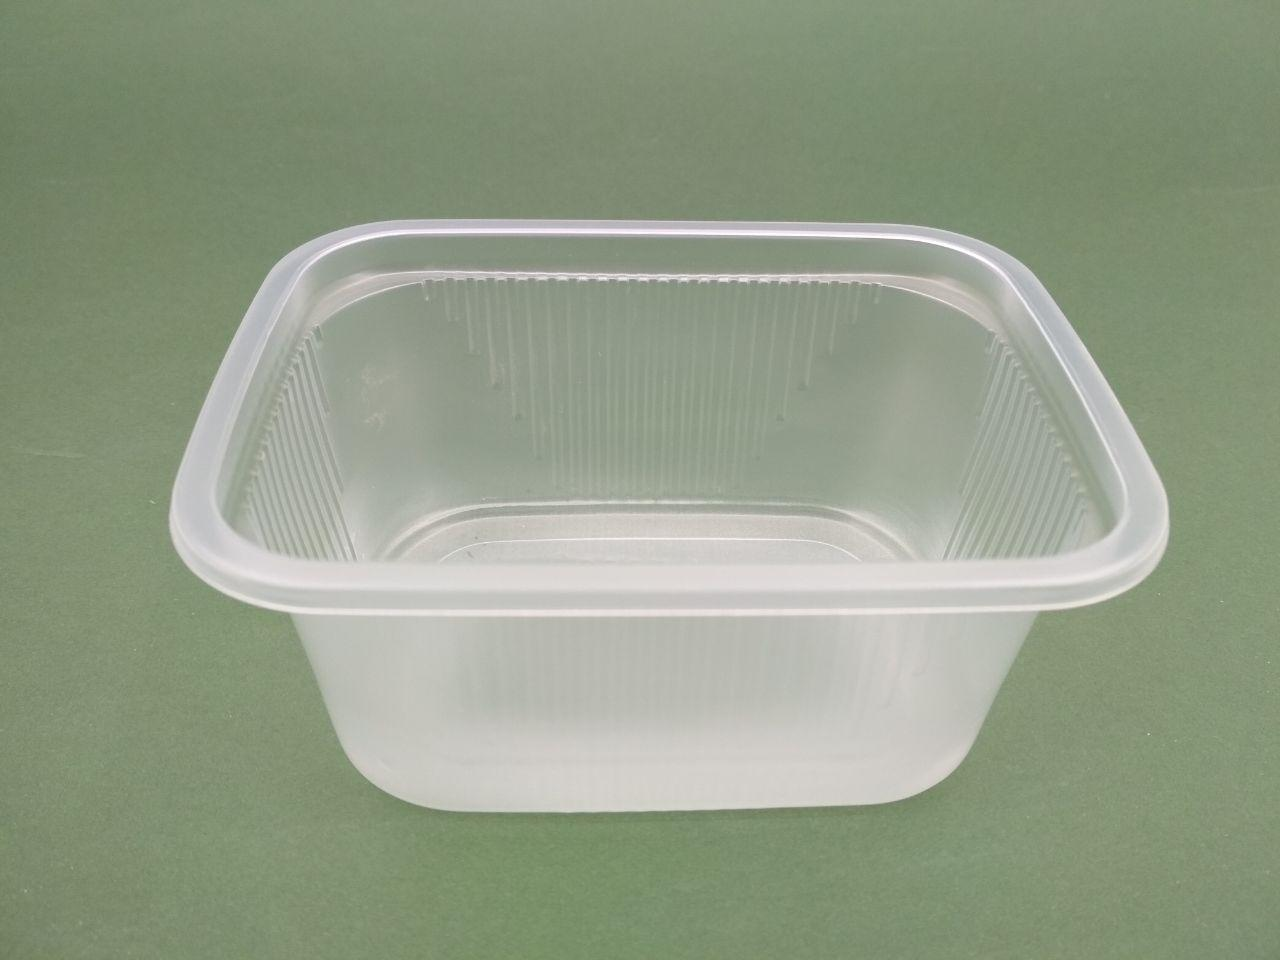 Одноразовый контейнер для супа, сметаны, меда, салатов SL5882, (V=250мл), 50 шт/пач